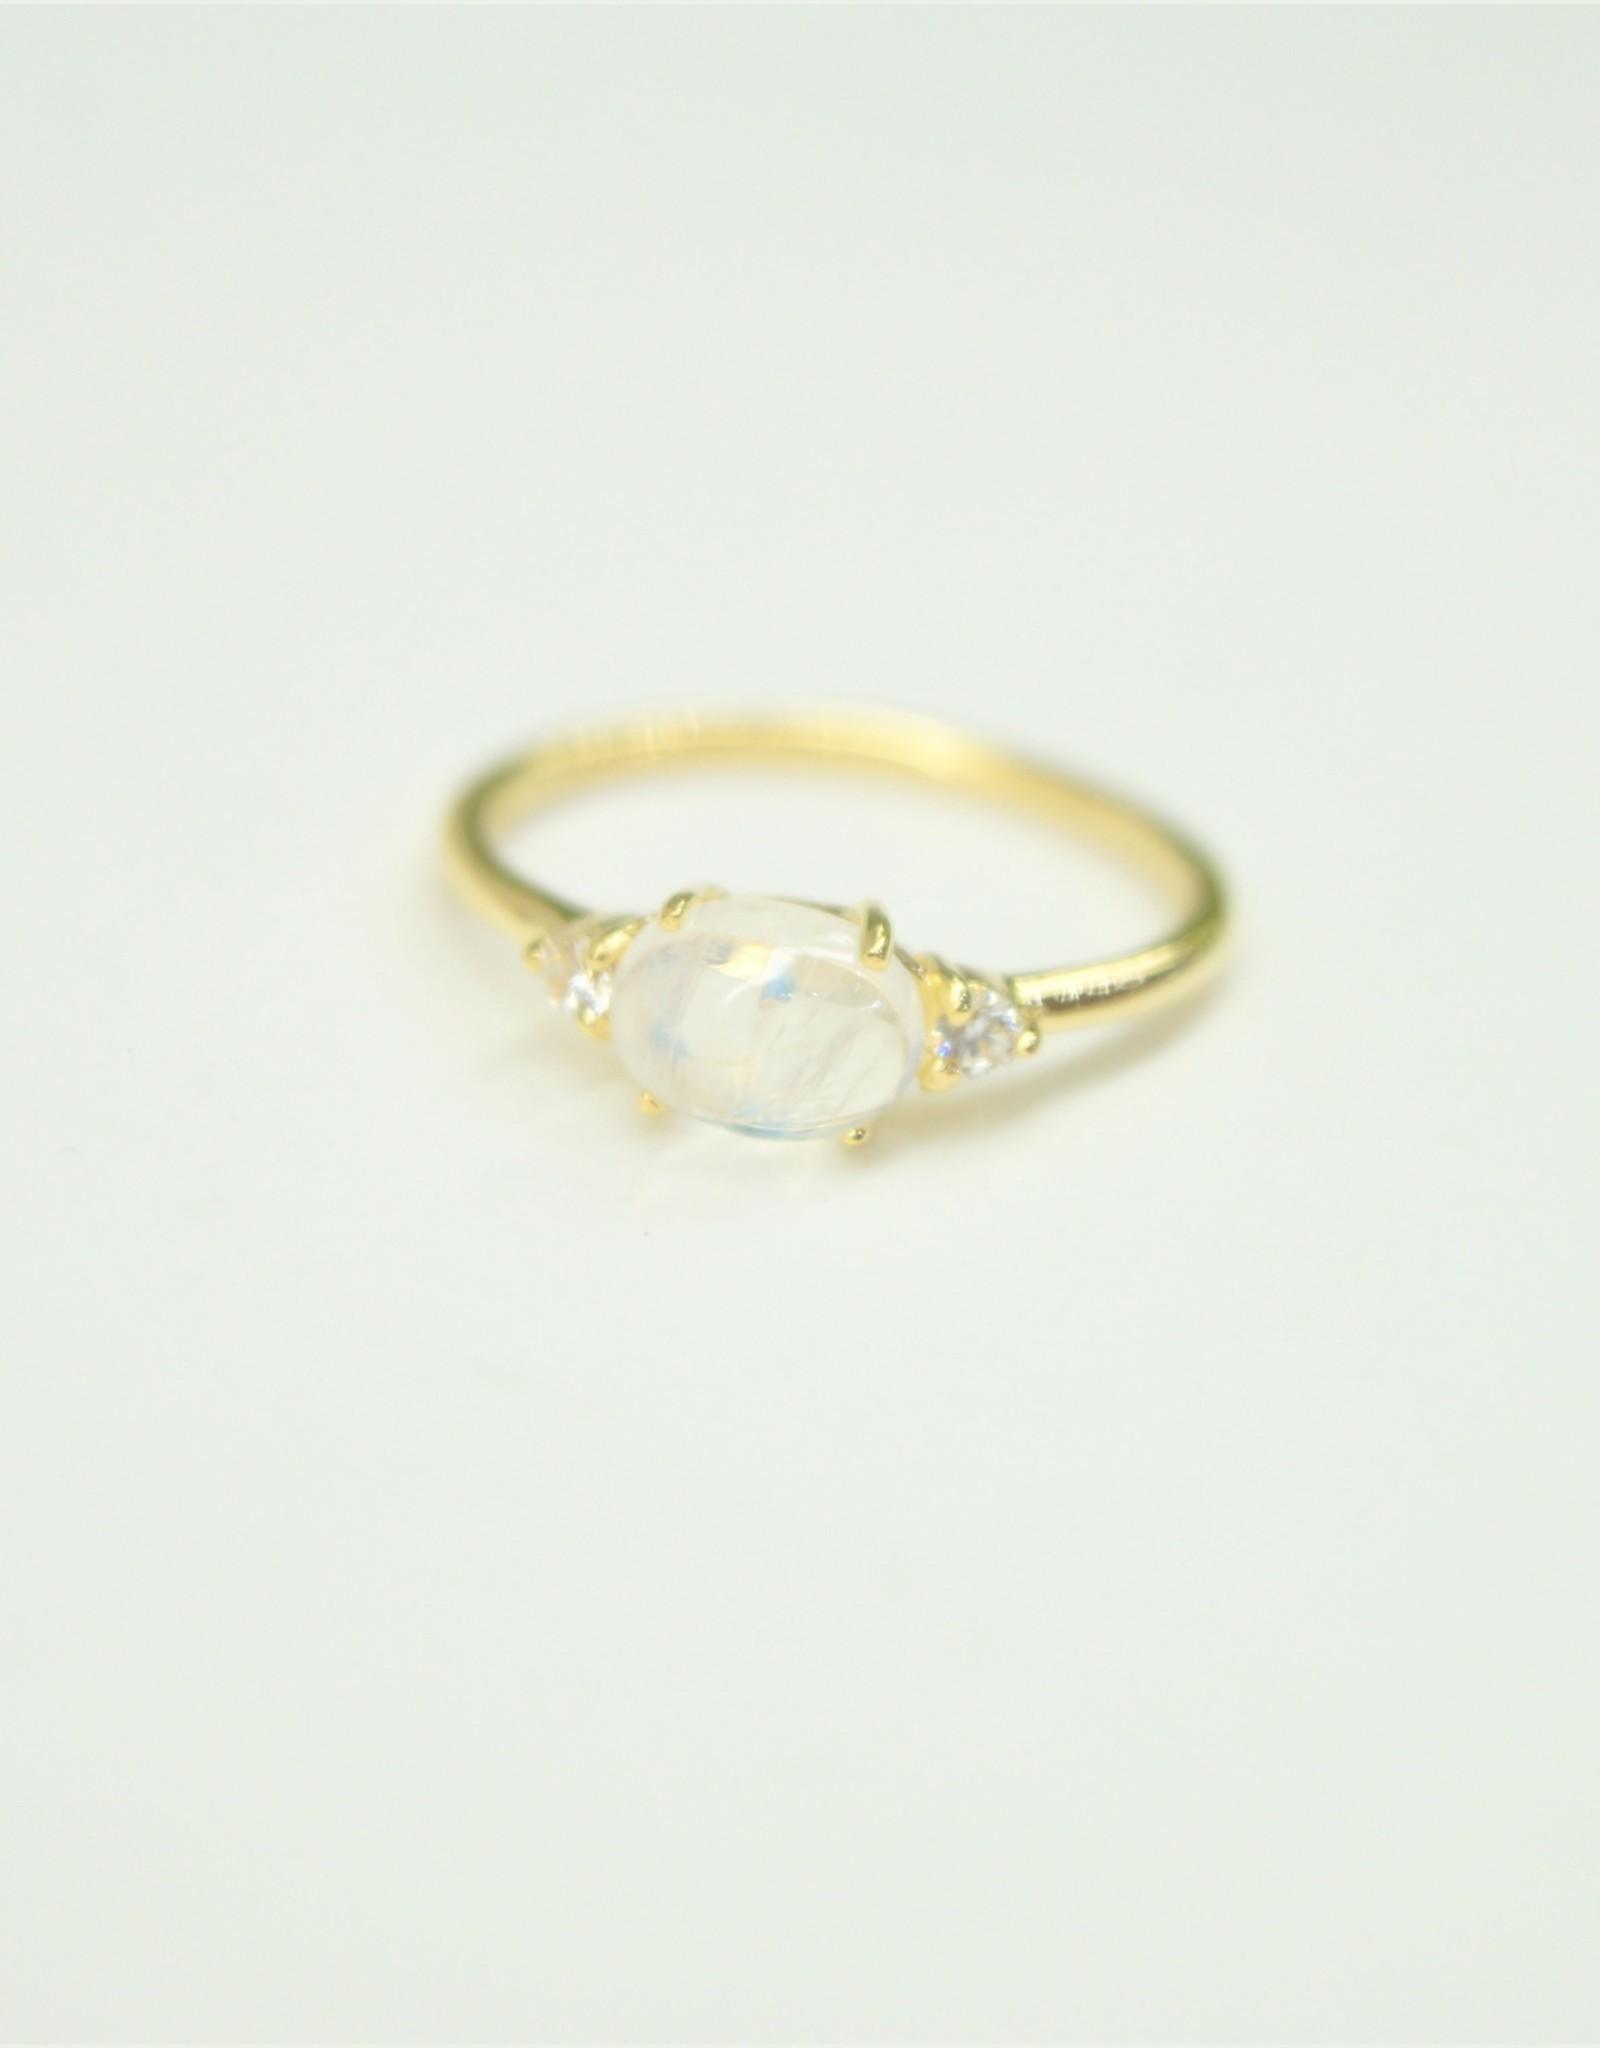 Tashi Oval Rainbow Moonstone / Cubic Zirconia Ring - Gold Vermeil